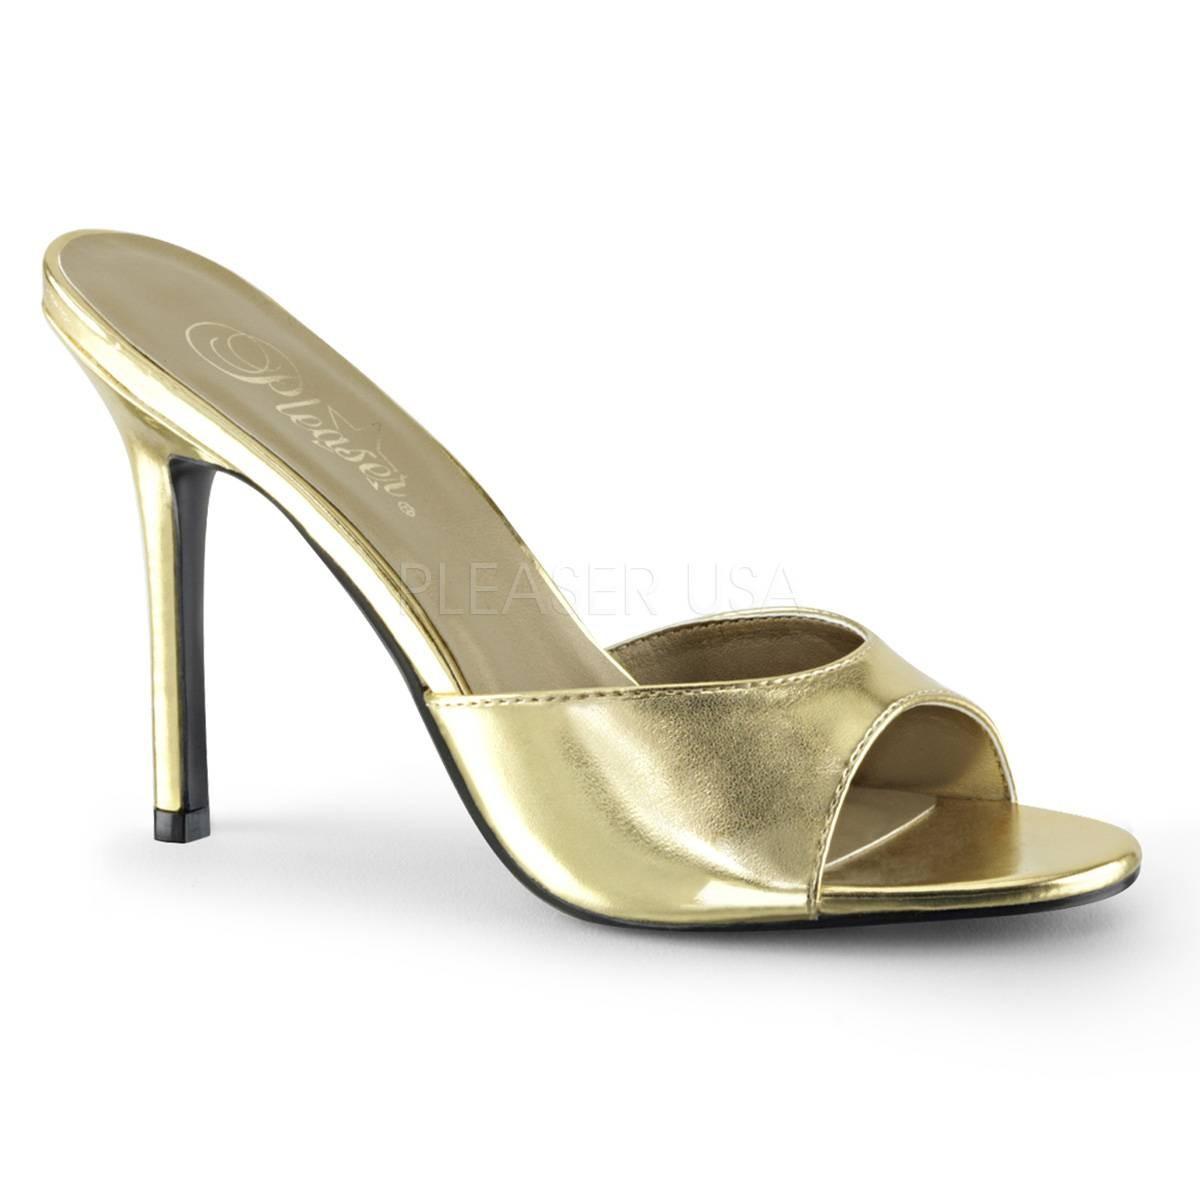 Sandalen - CLASSIQUE 01 ° Damen Sandalette ° GoldMatt ° Pleaser  - Onlineshop RedSixty